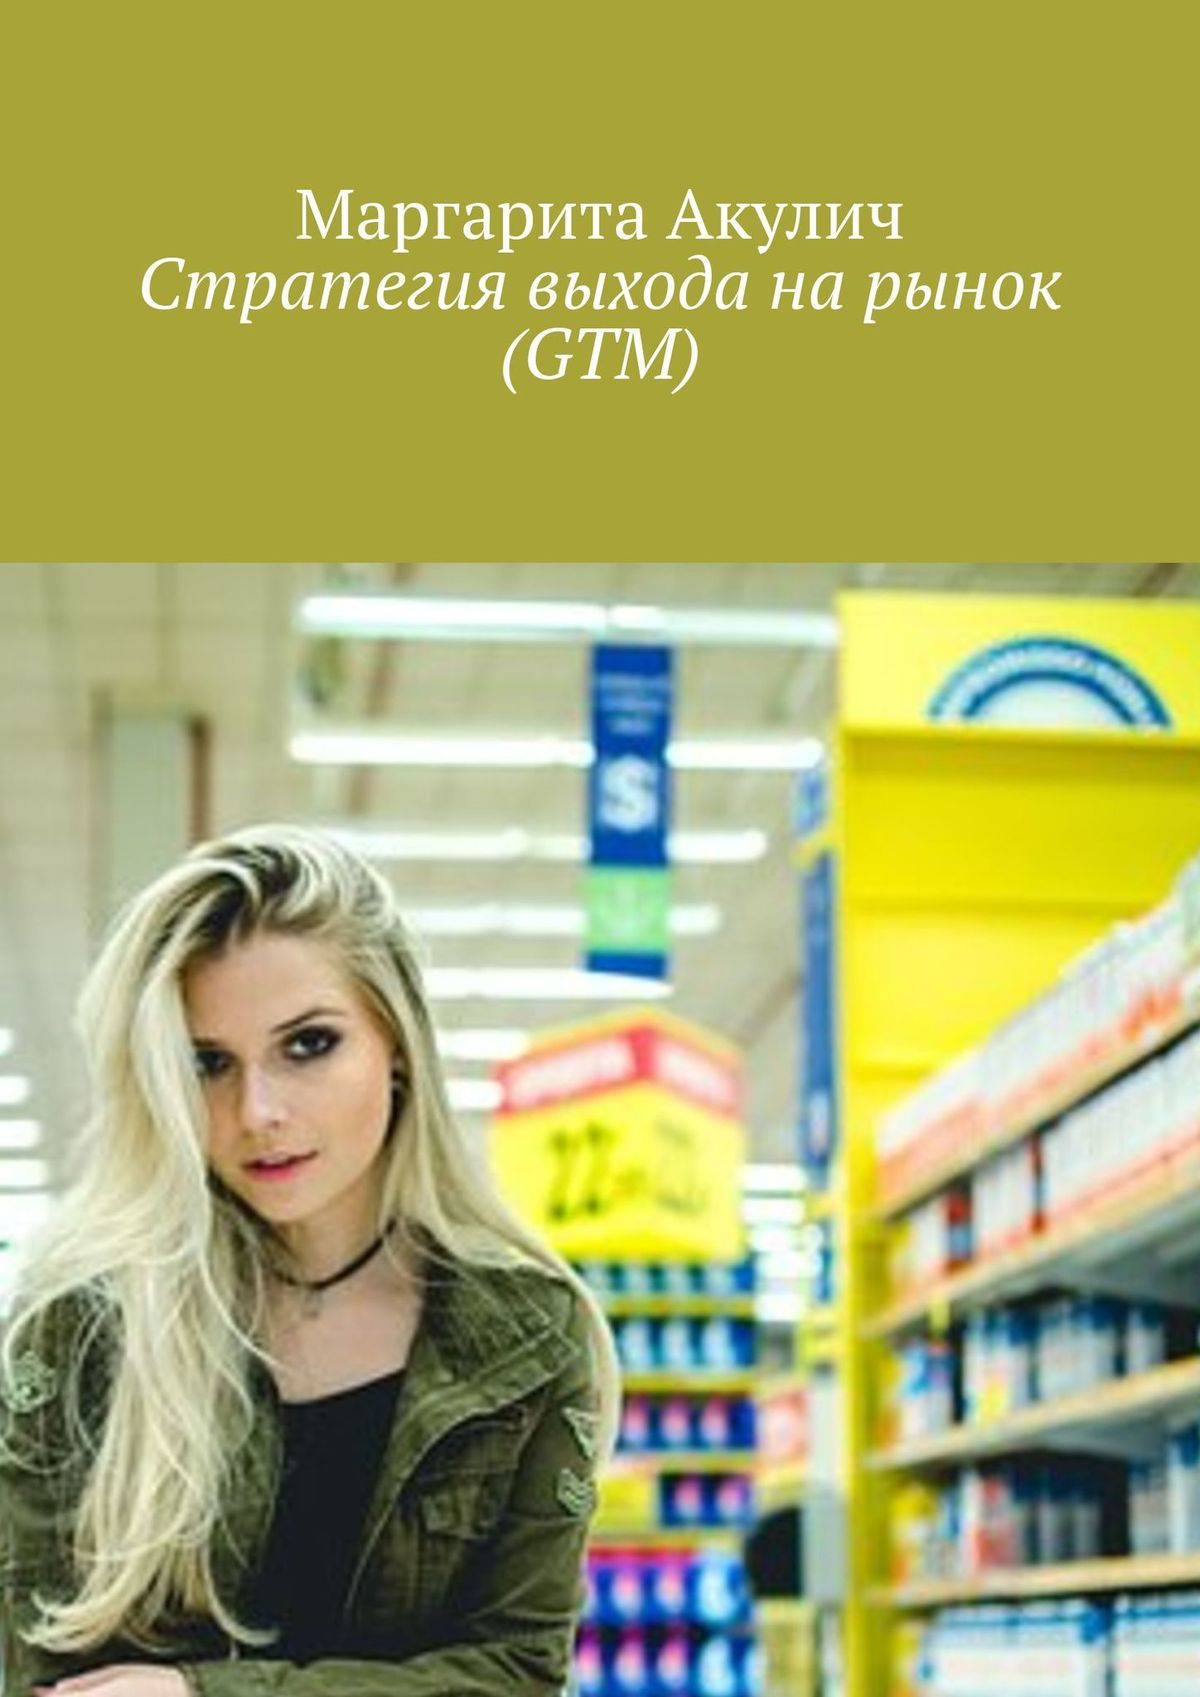 Маргарита Акулич Стратегия выхода нарынок (GTM)